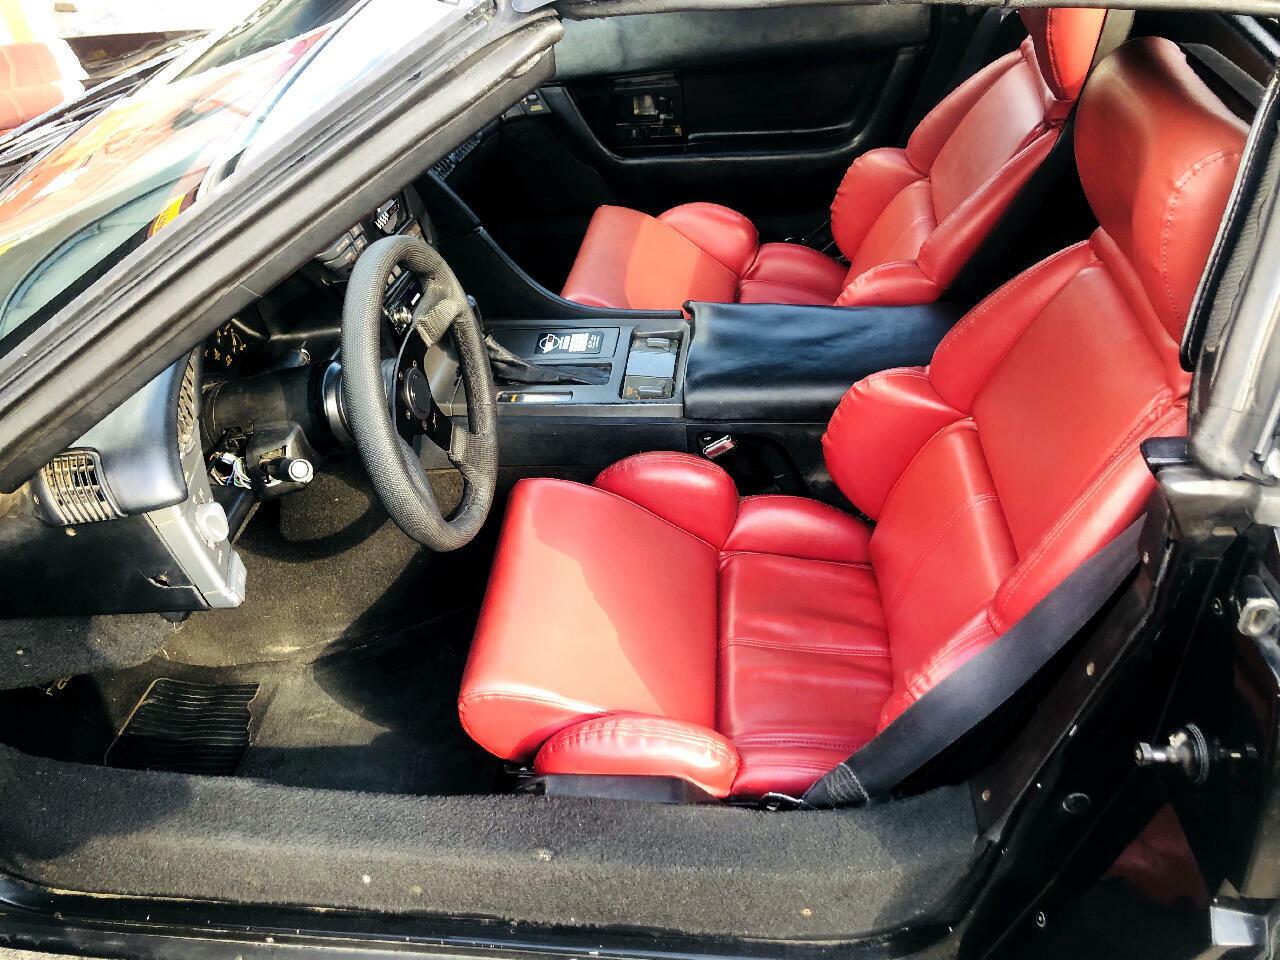 1991 Black Chevrolet Corvette Convertible  | C4 Corvette Photo 6